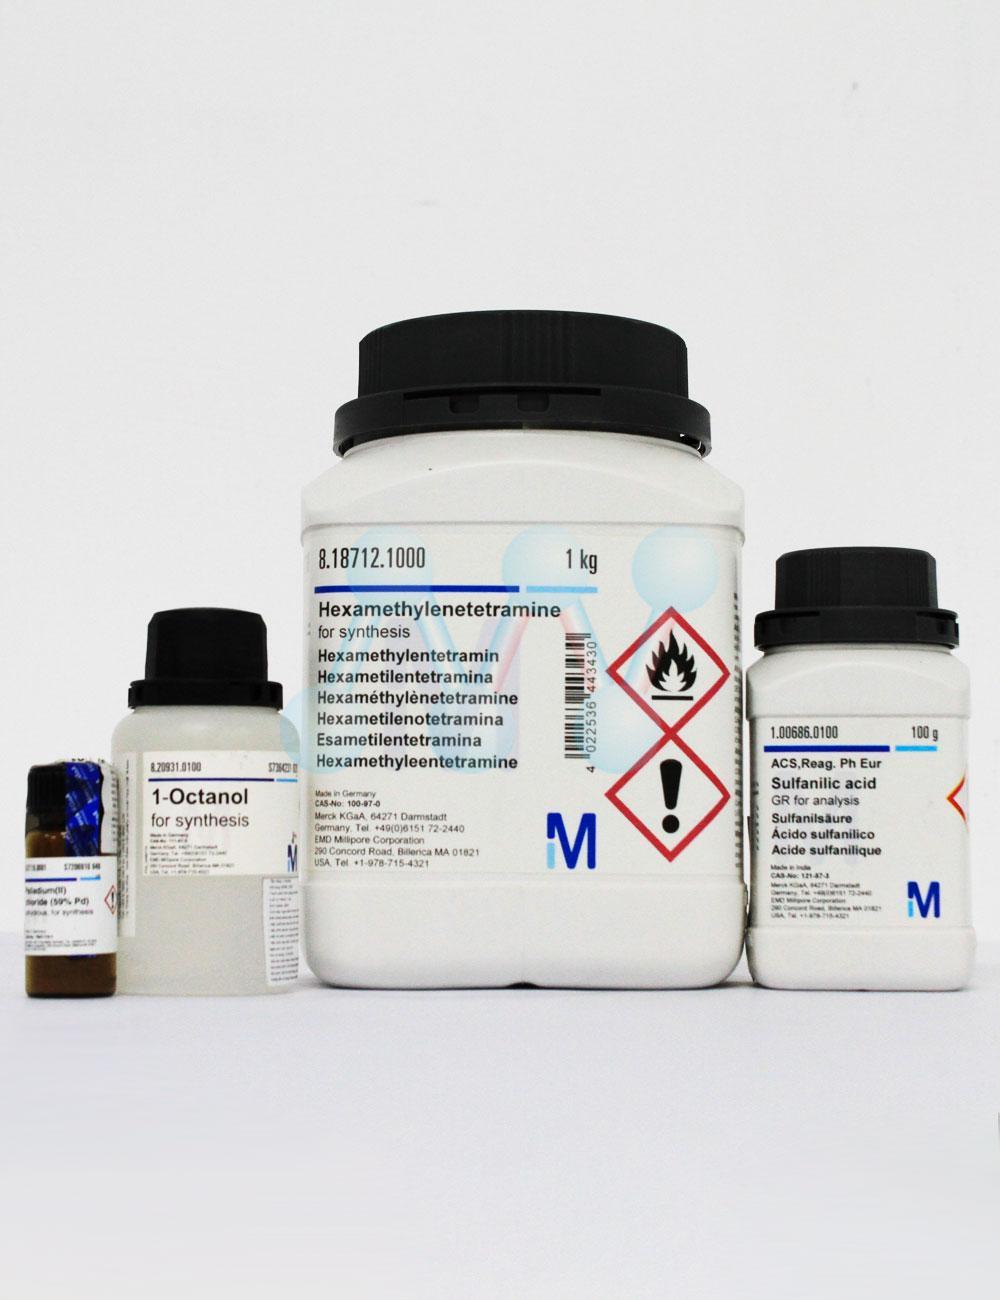 Benzoyl chloride C6H5COCl